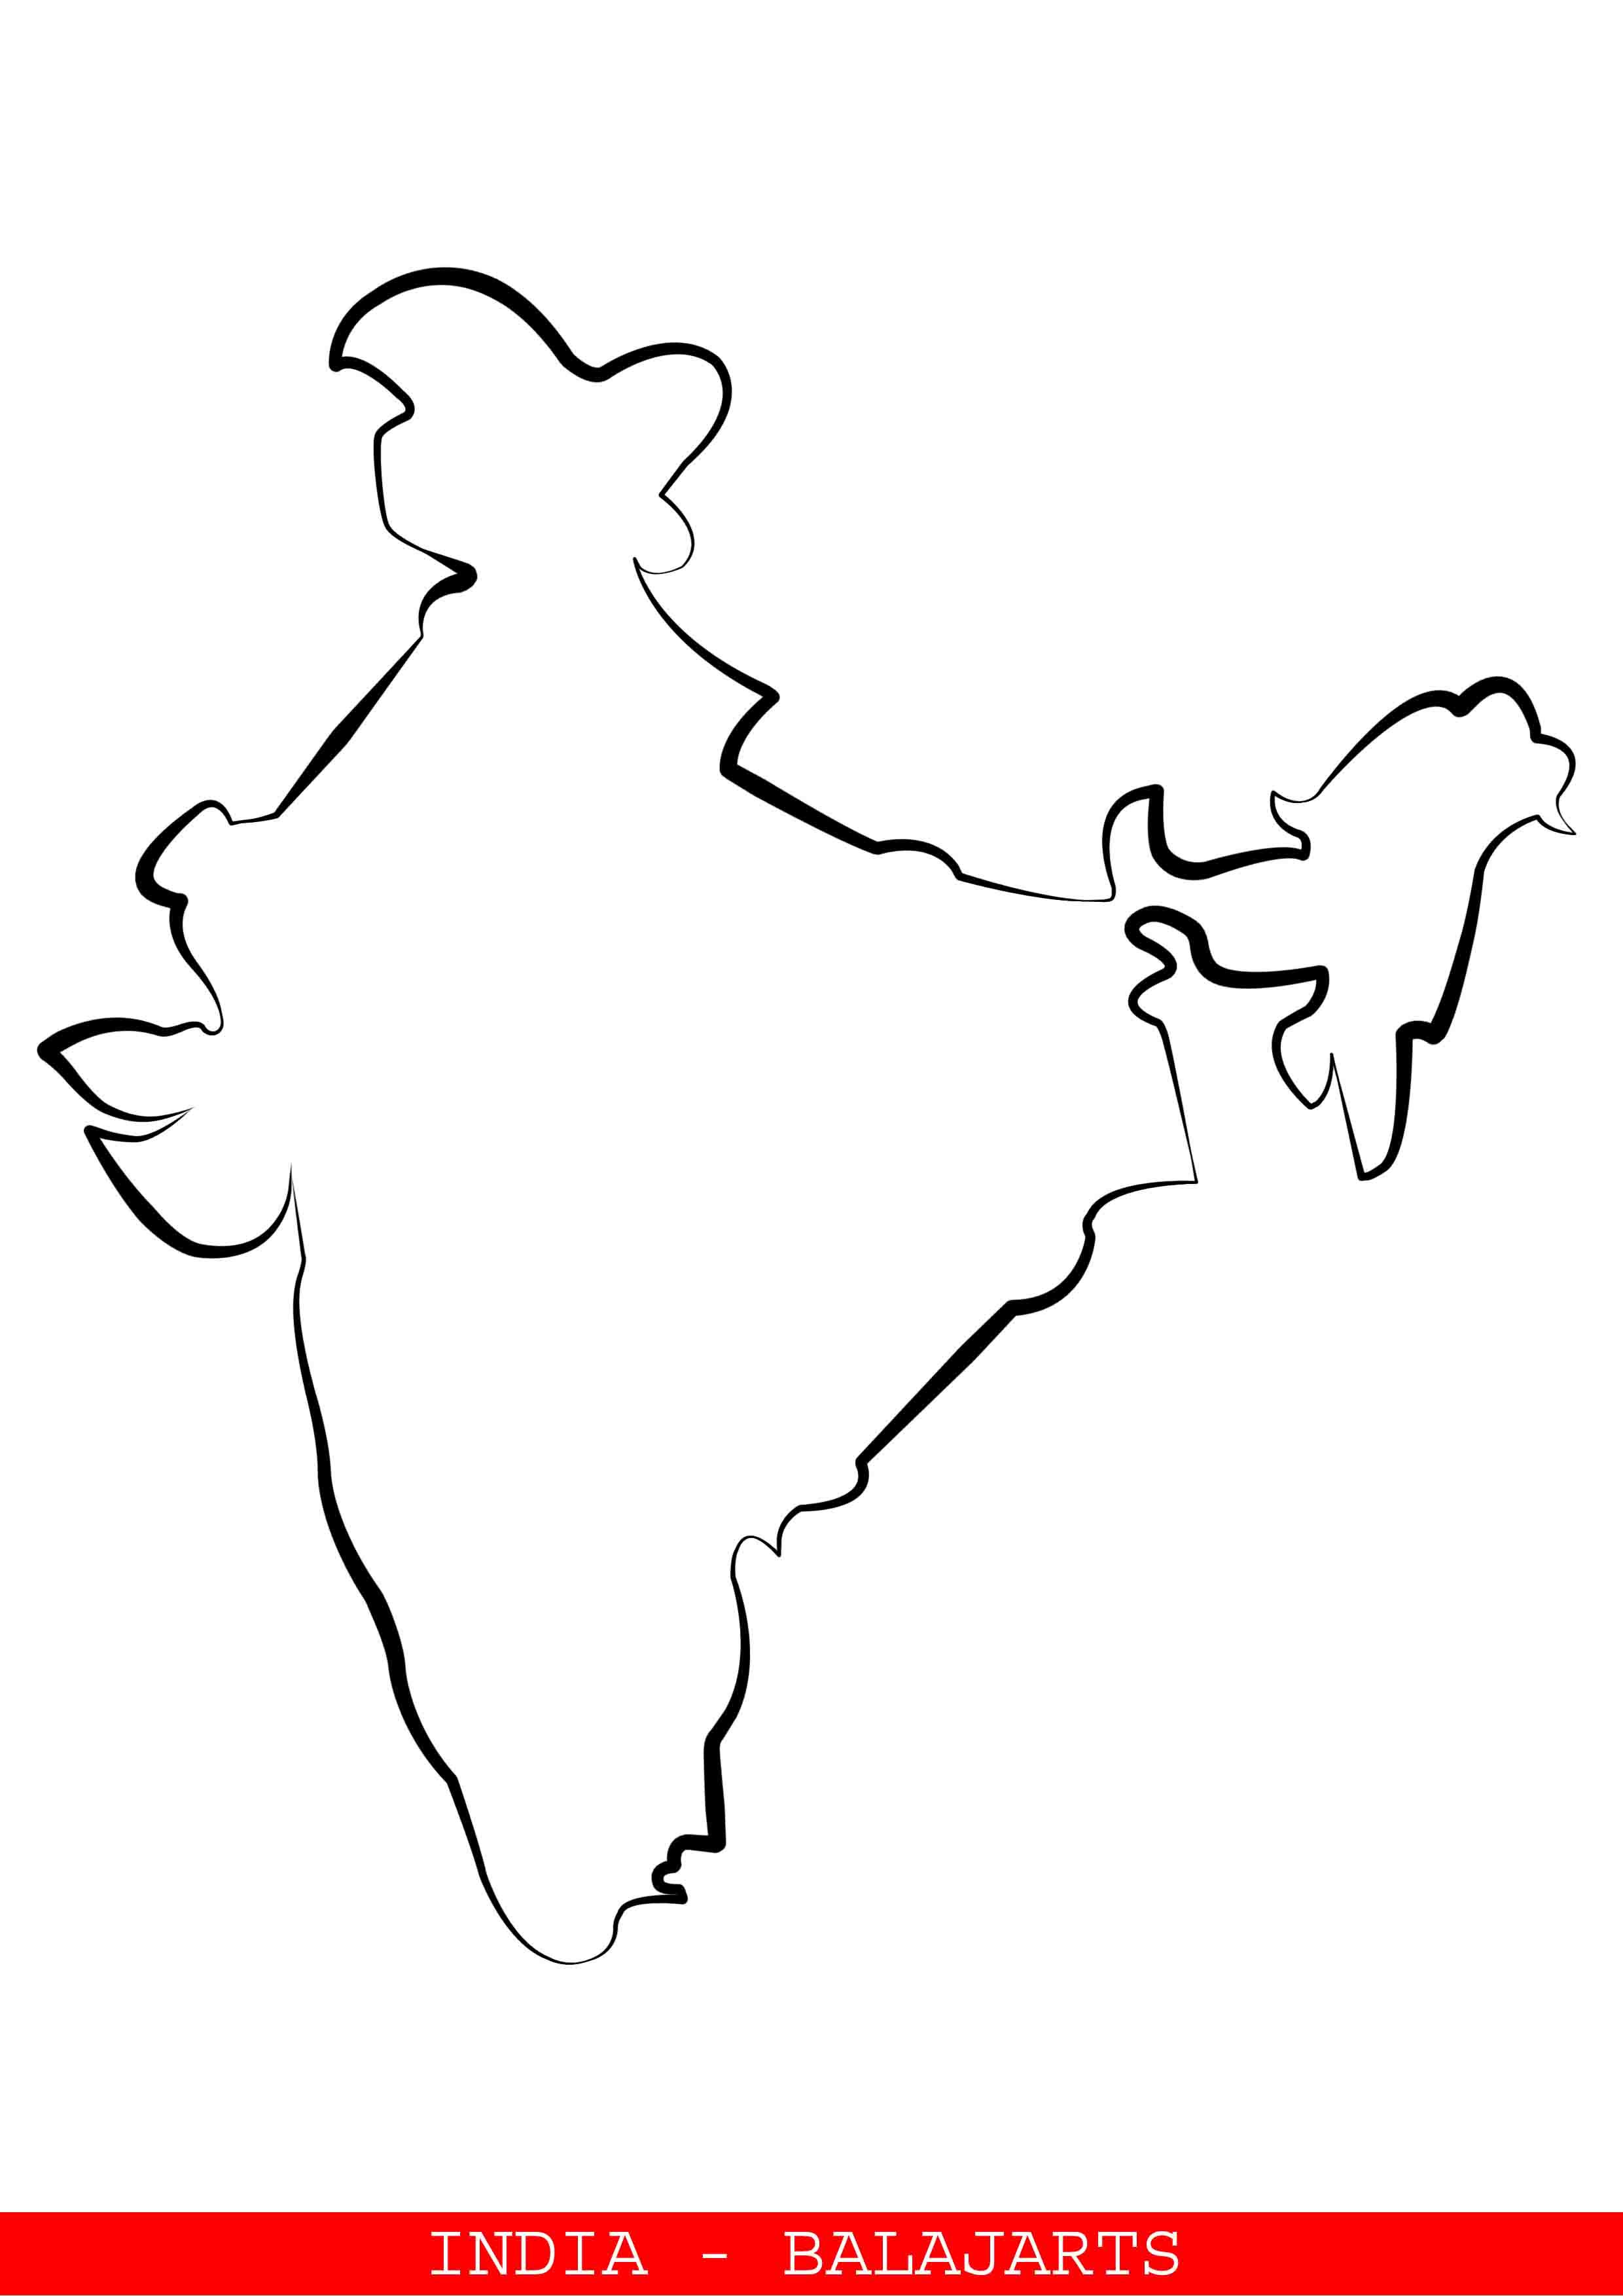 How To Draw India : india, INDIA, BALAJARTS, Balaj, 9345211057